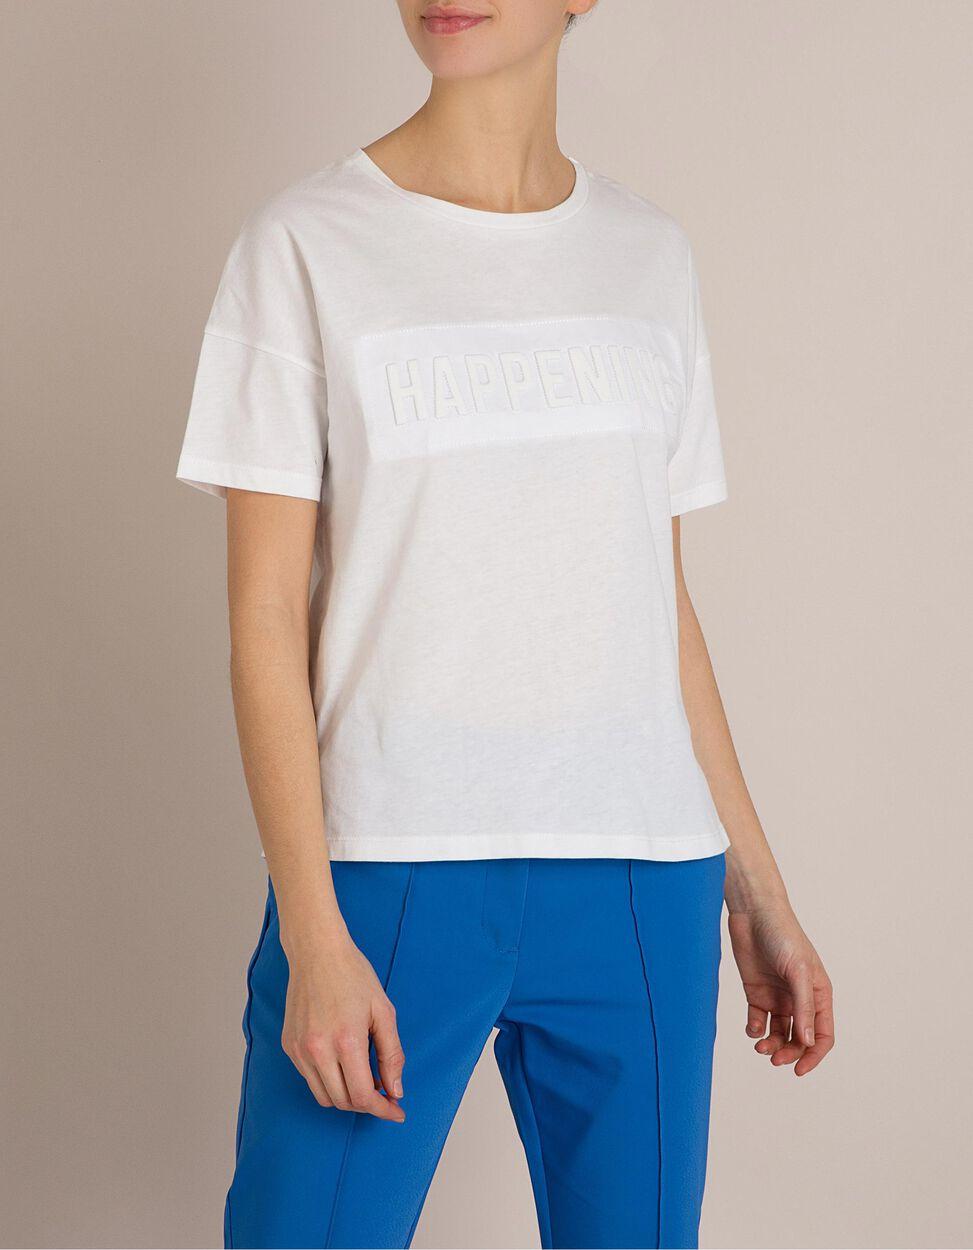 T-Shirt Happening